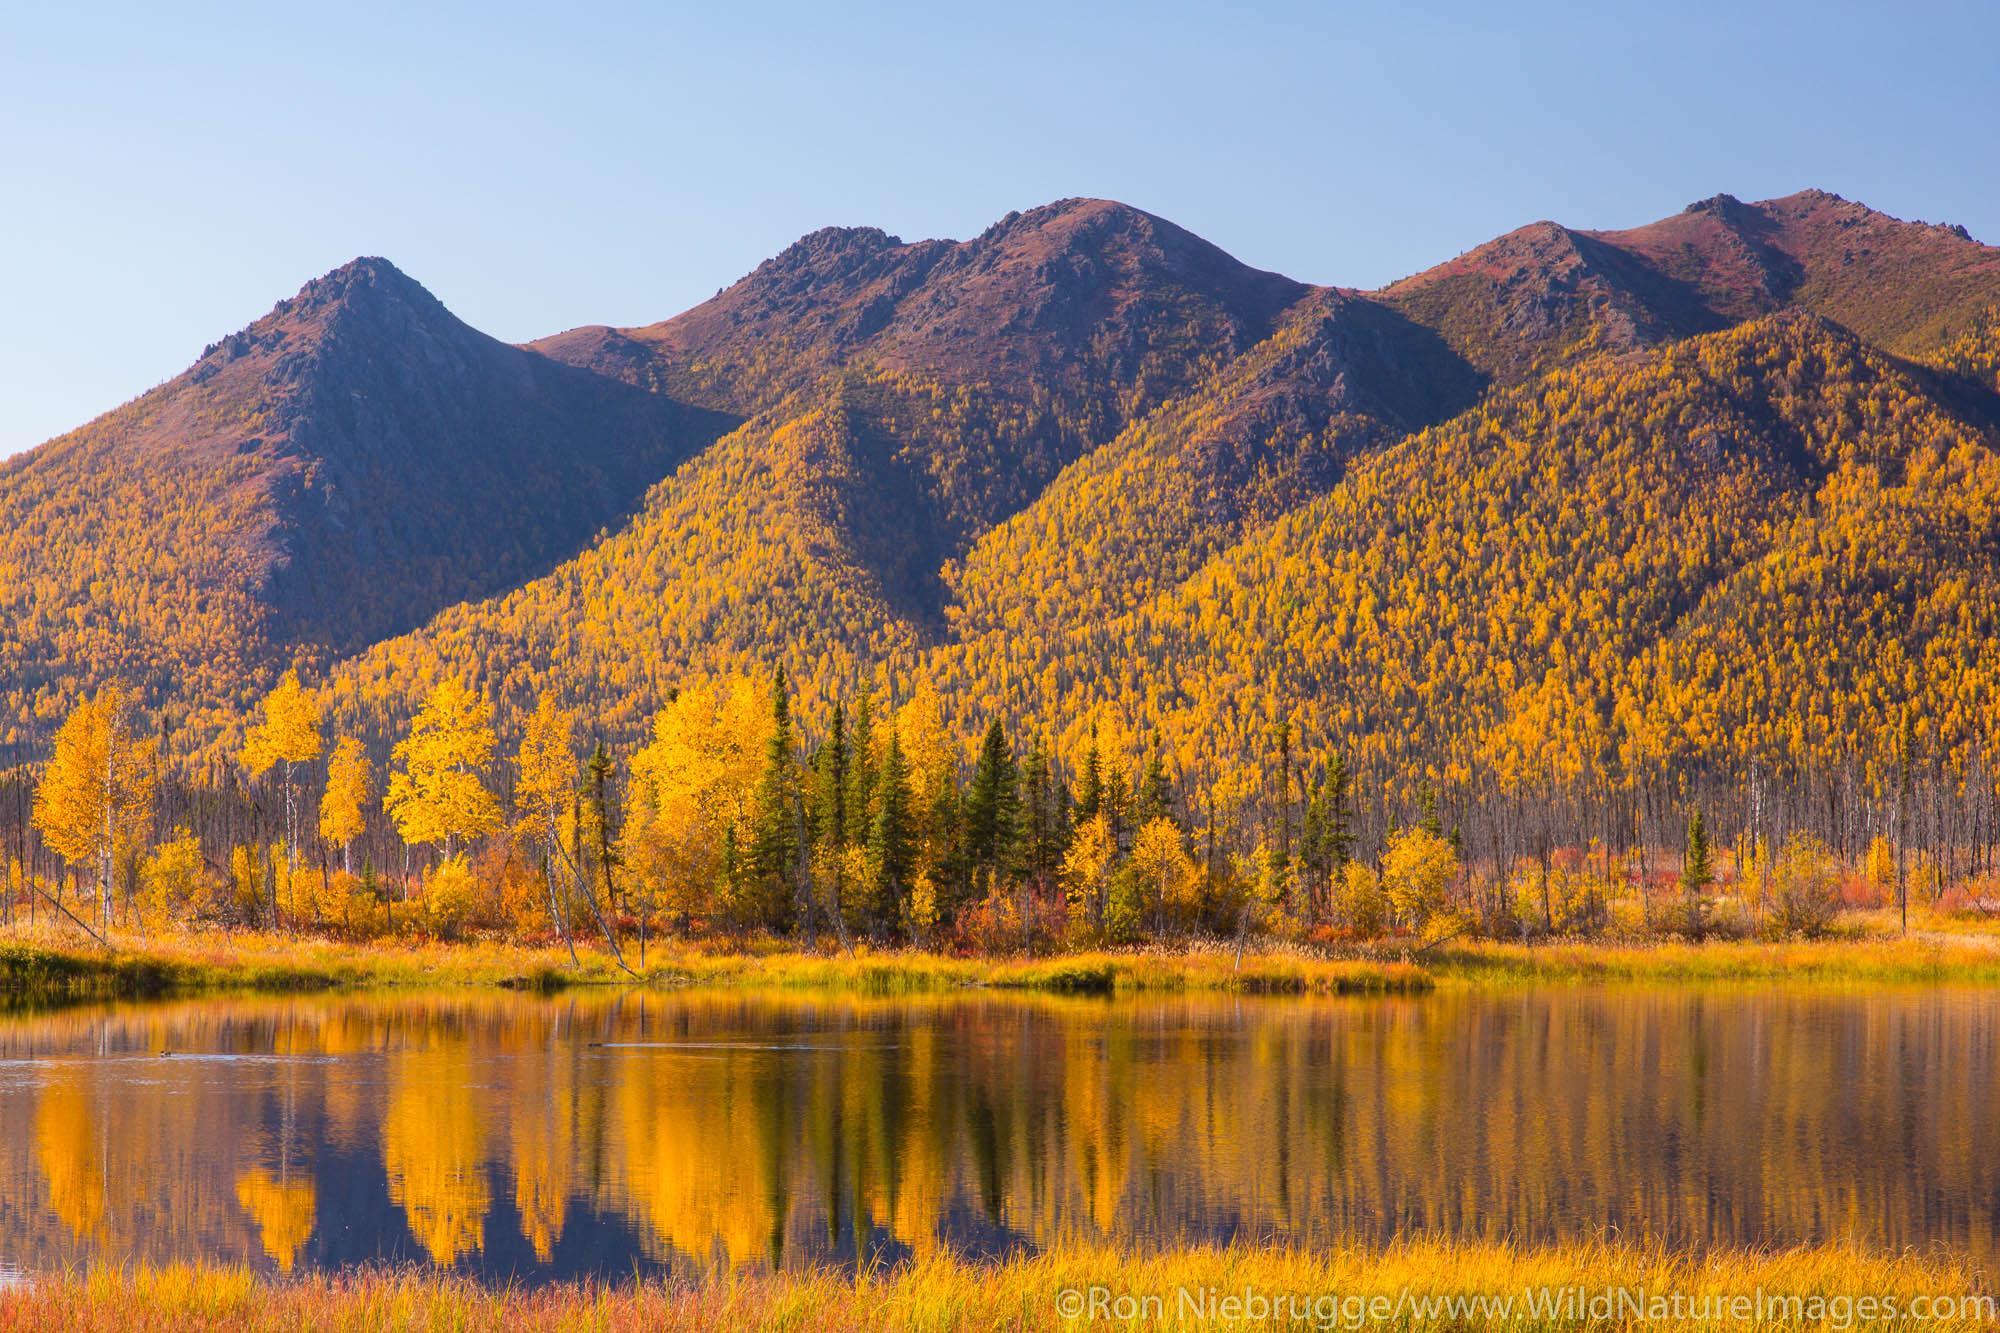 Brooks Range from the Dalton Highway, Alaska.